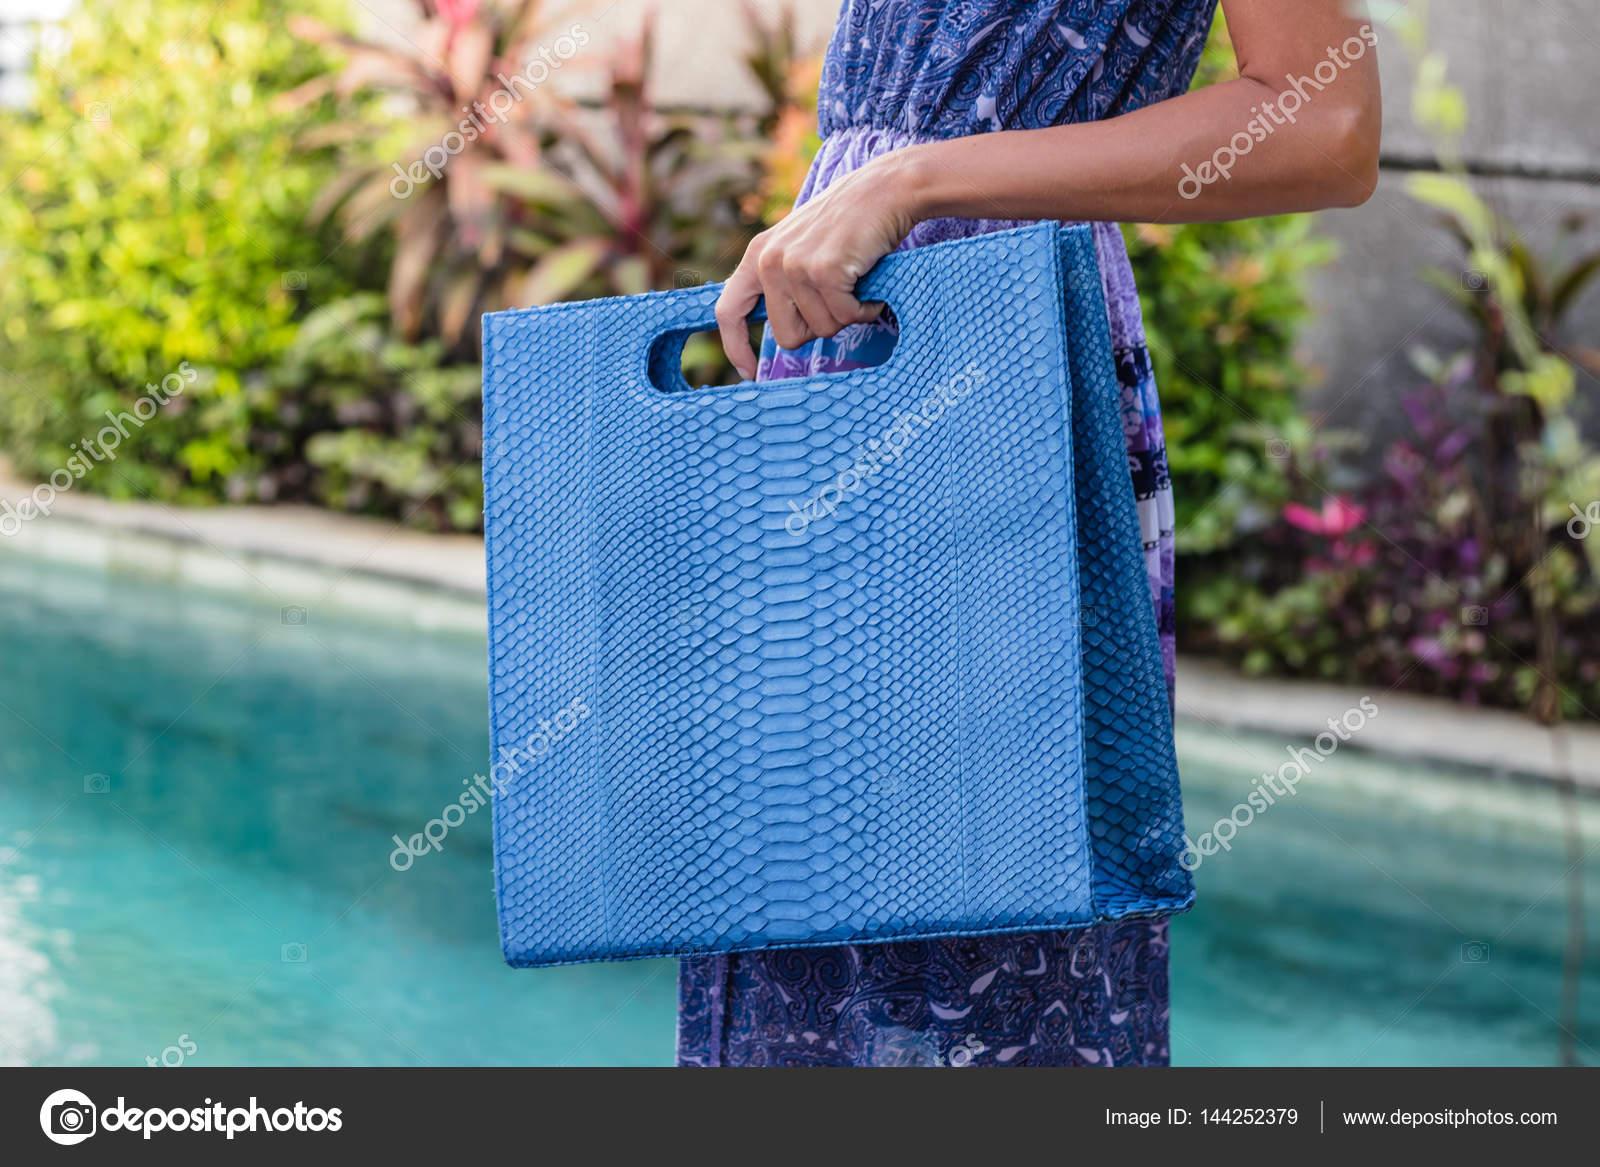 f6d869cc83 Μοντέρνα όμορφα μεγάλα μπλε δέρματος φιδιού python τσάντα στο μπράτσο του  κοριτσιού σε ένα μοντέρνο φόρεμα